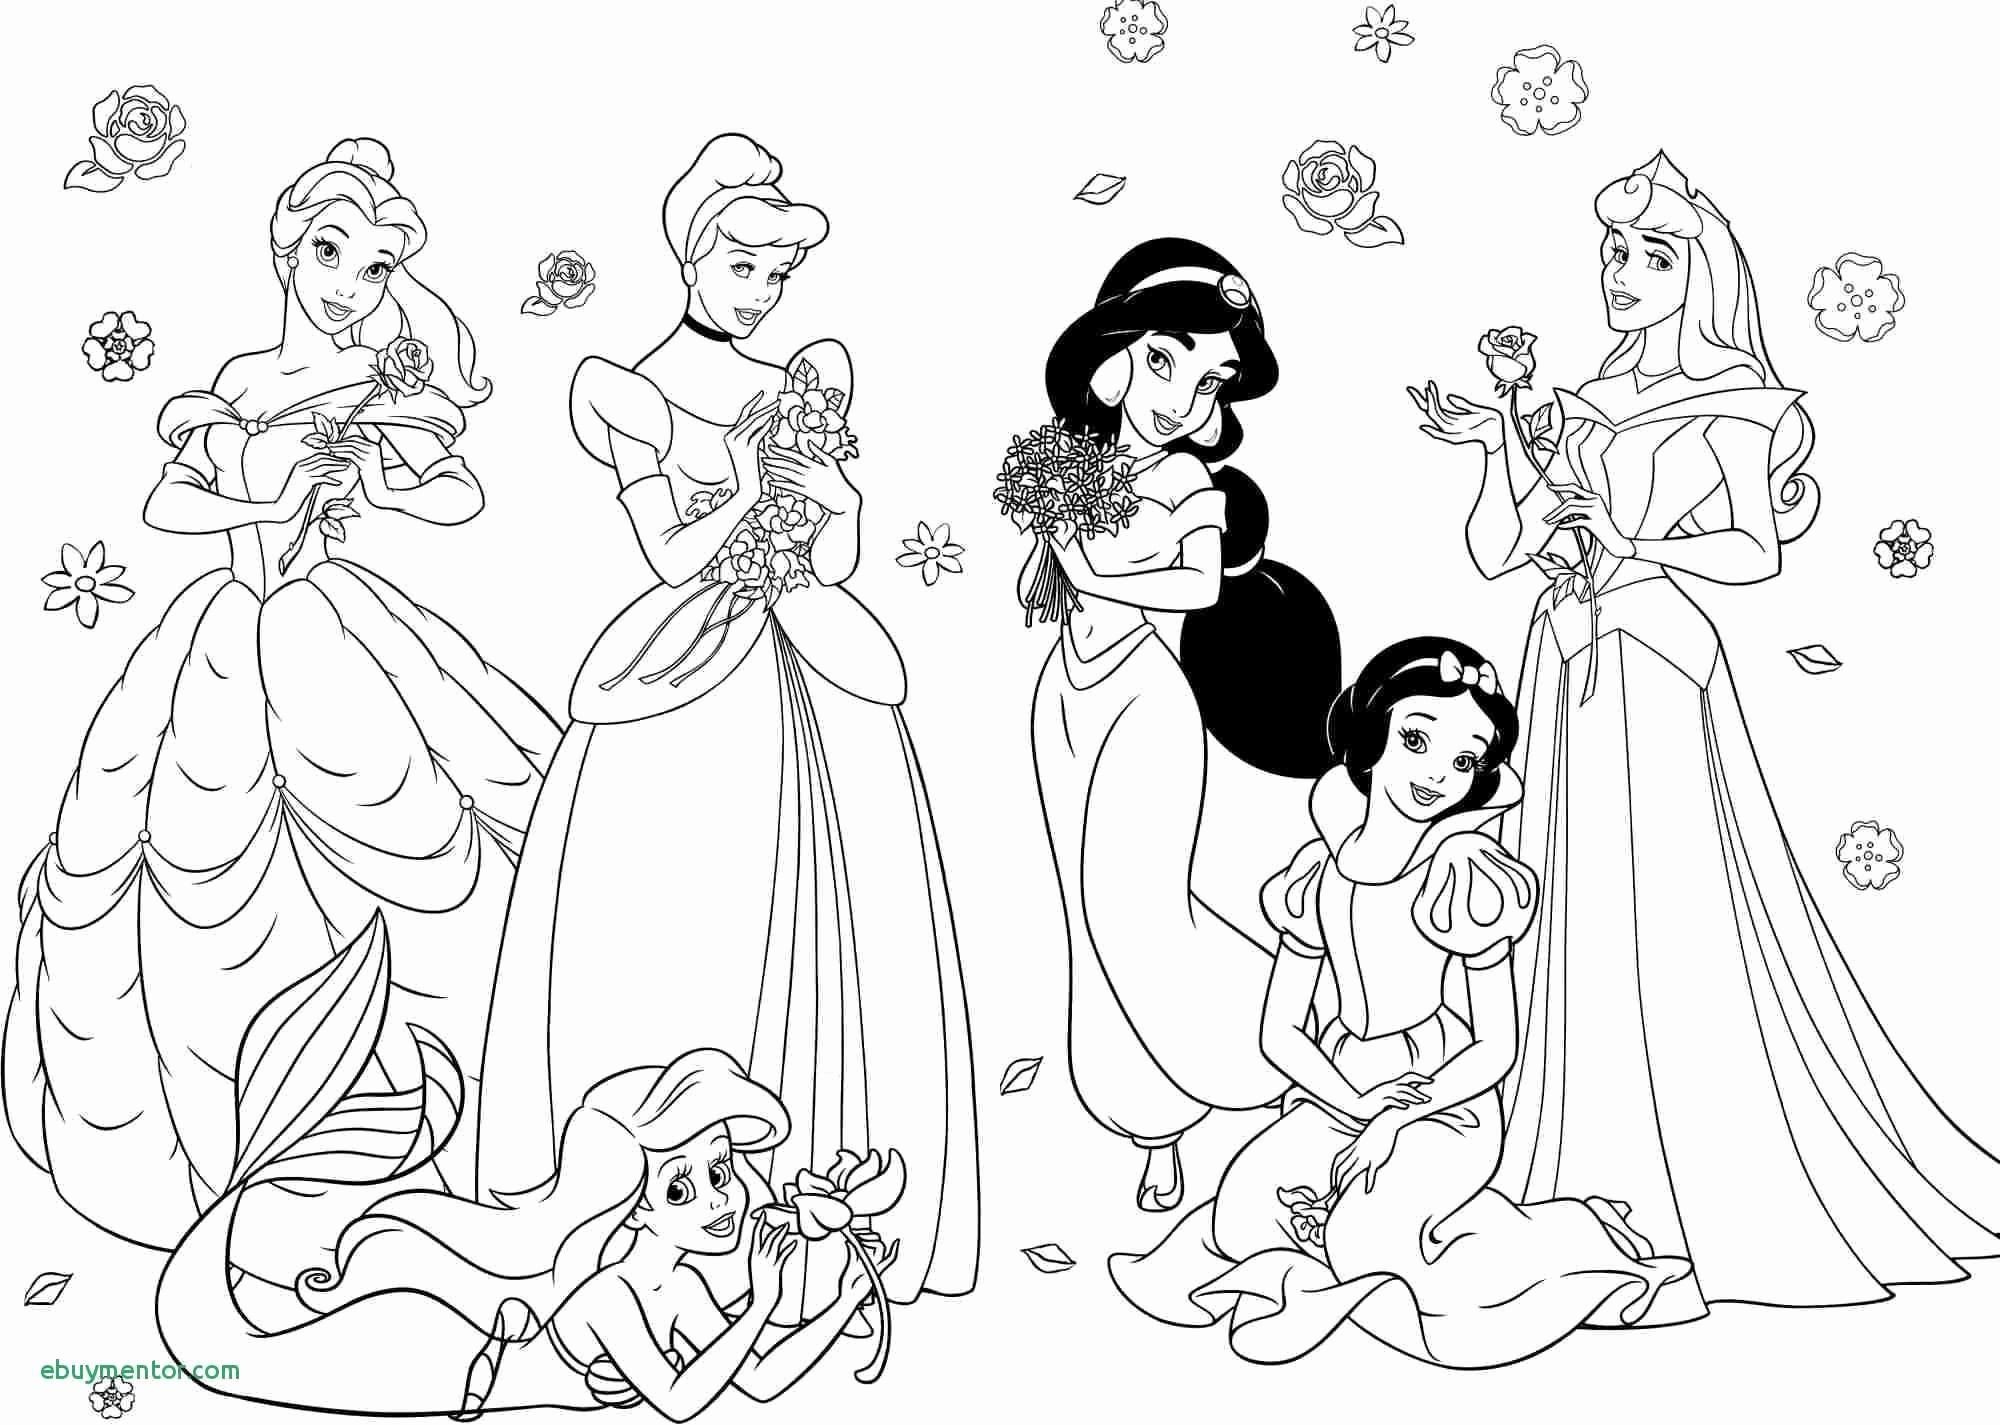 Princess Coloring Sheets Printable Luxury 40 Inspirational Princess Colouring Games Gambar Putri Disney Buku Mewarnai Halaman Mewarnai